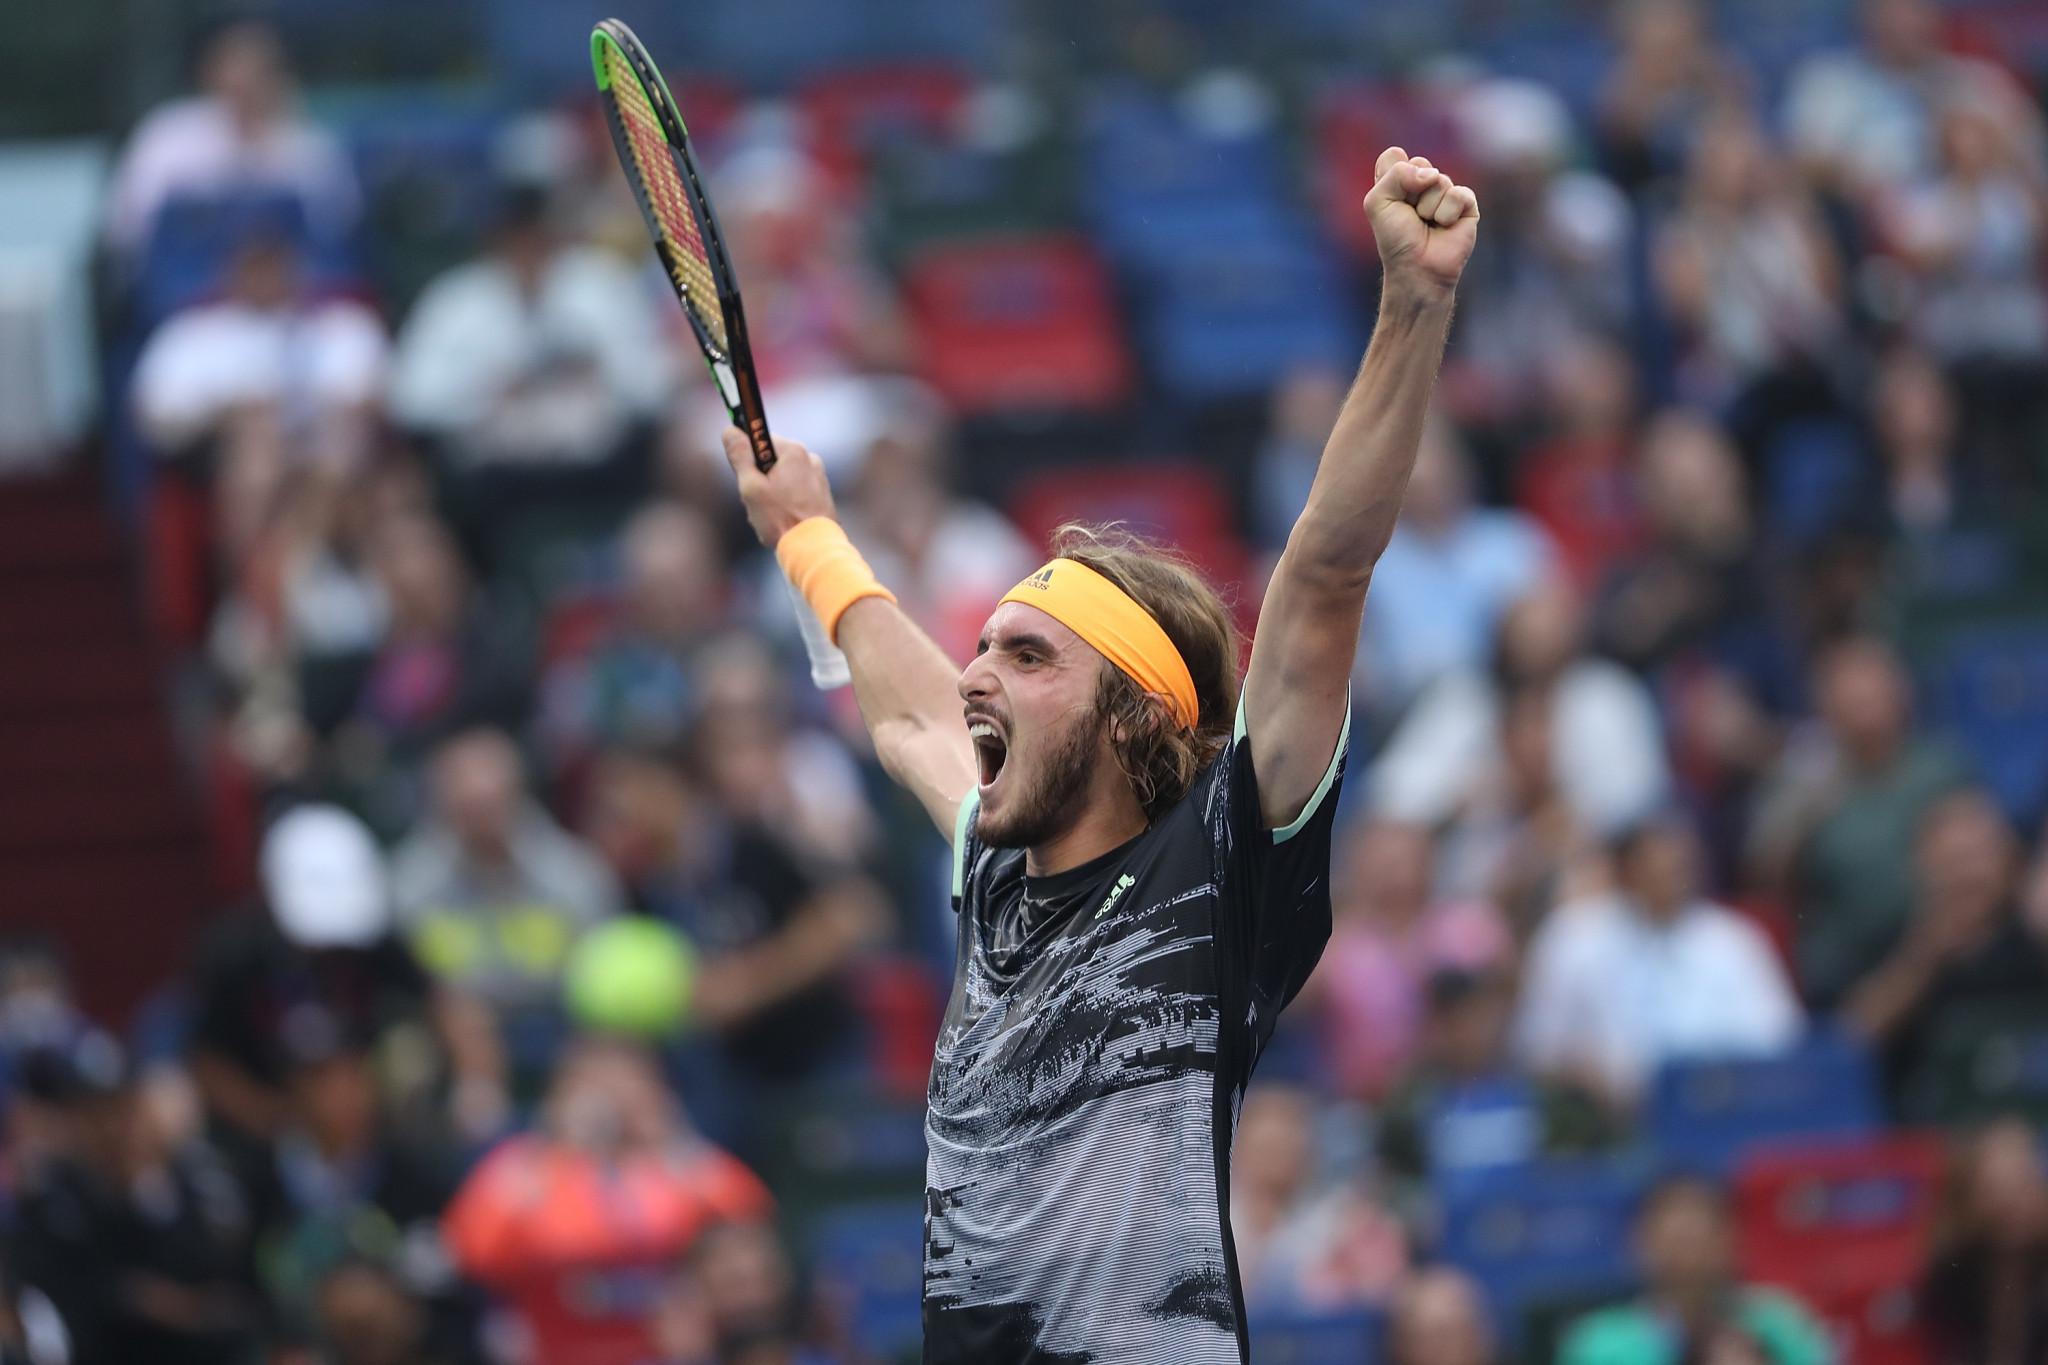 Tsitsipas stuns Djokovic to reach semi-finals at Shanghai Masters